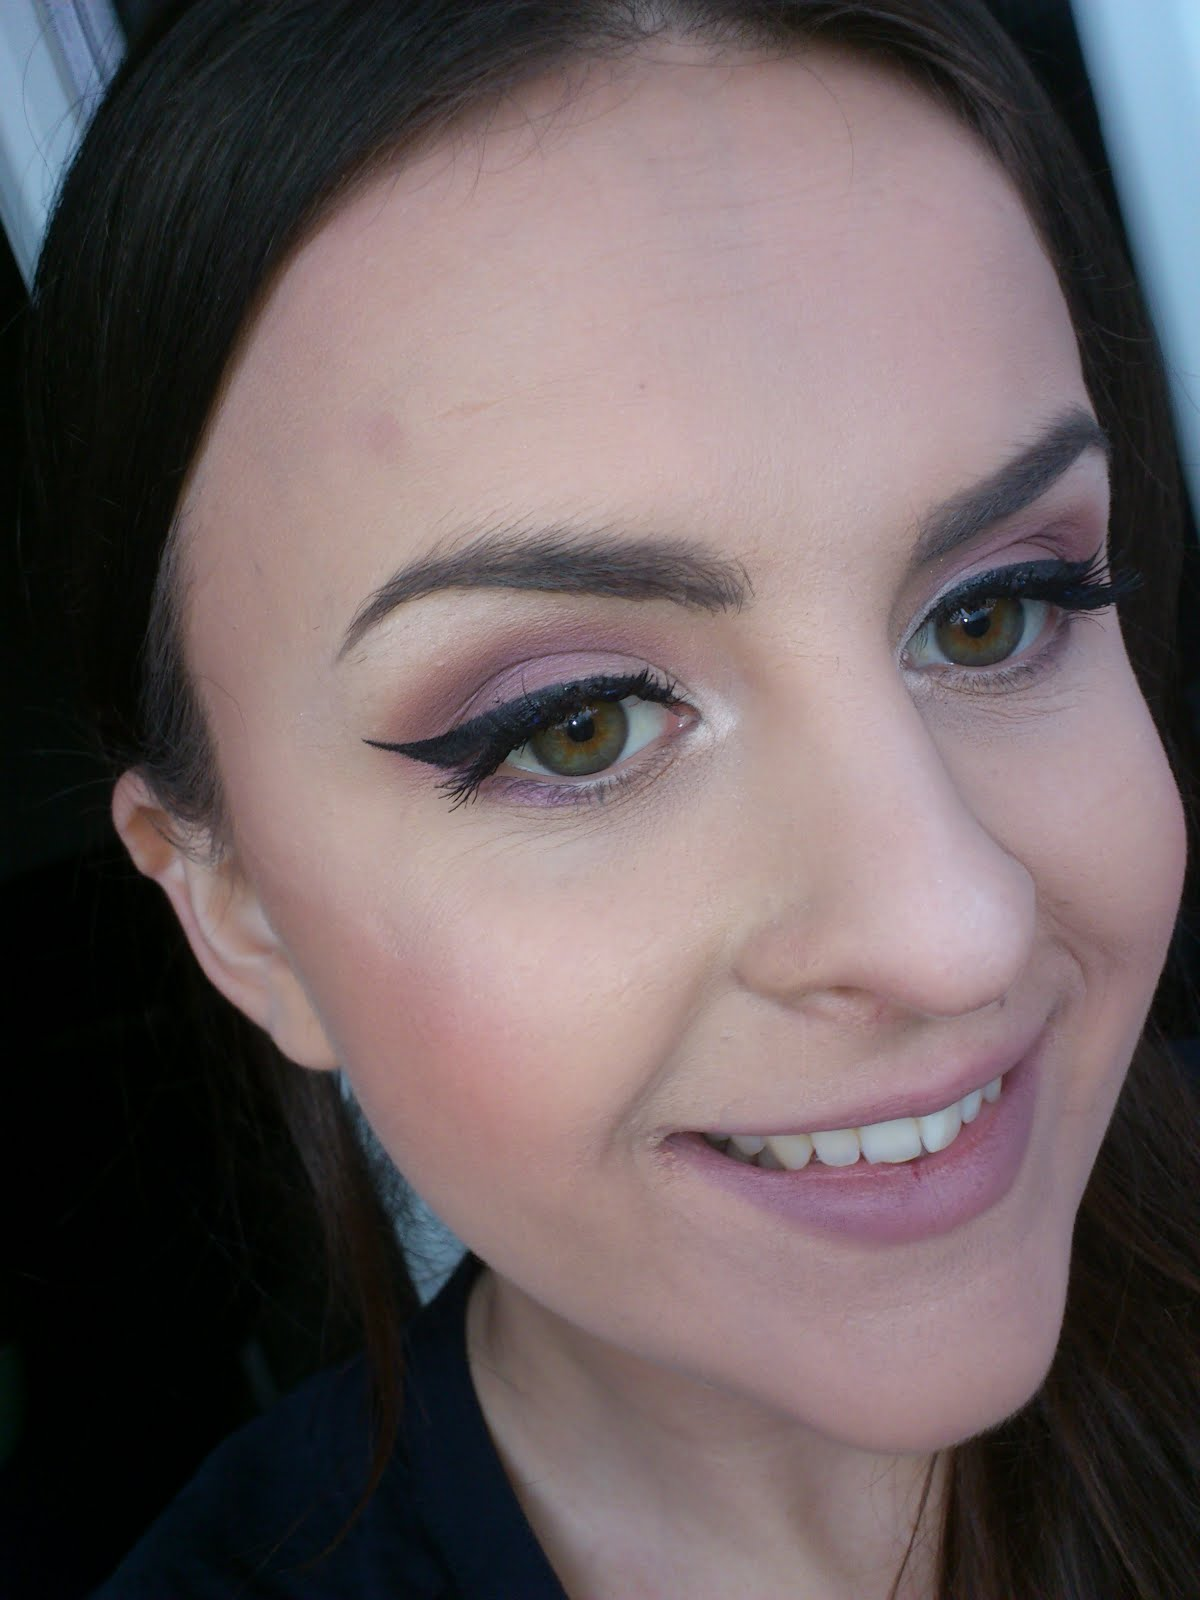 Makeup Post Youtube: Watupkizzerandb: Novi Post / Purple Makeup / 2 Outfita